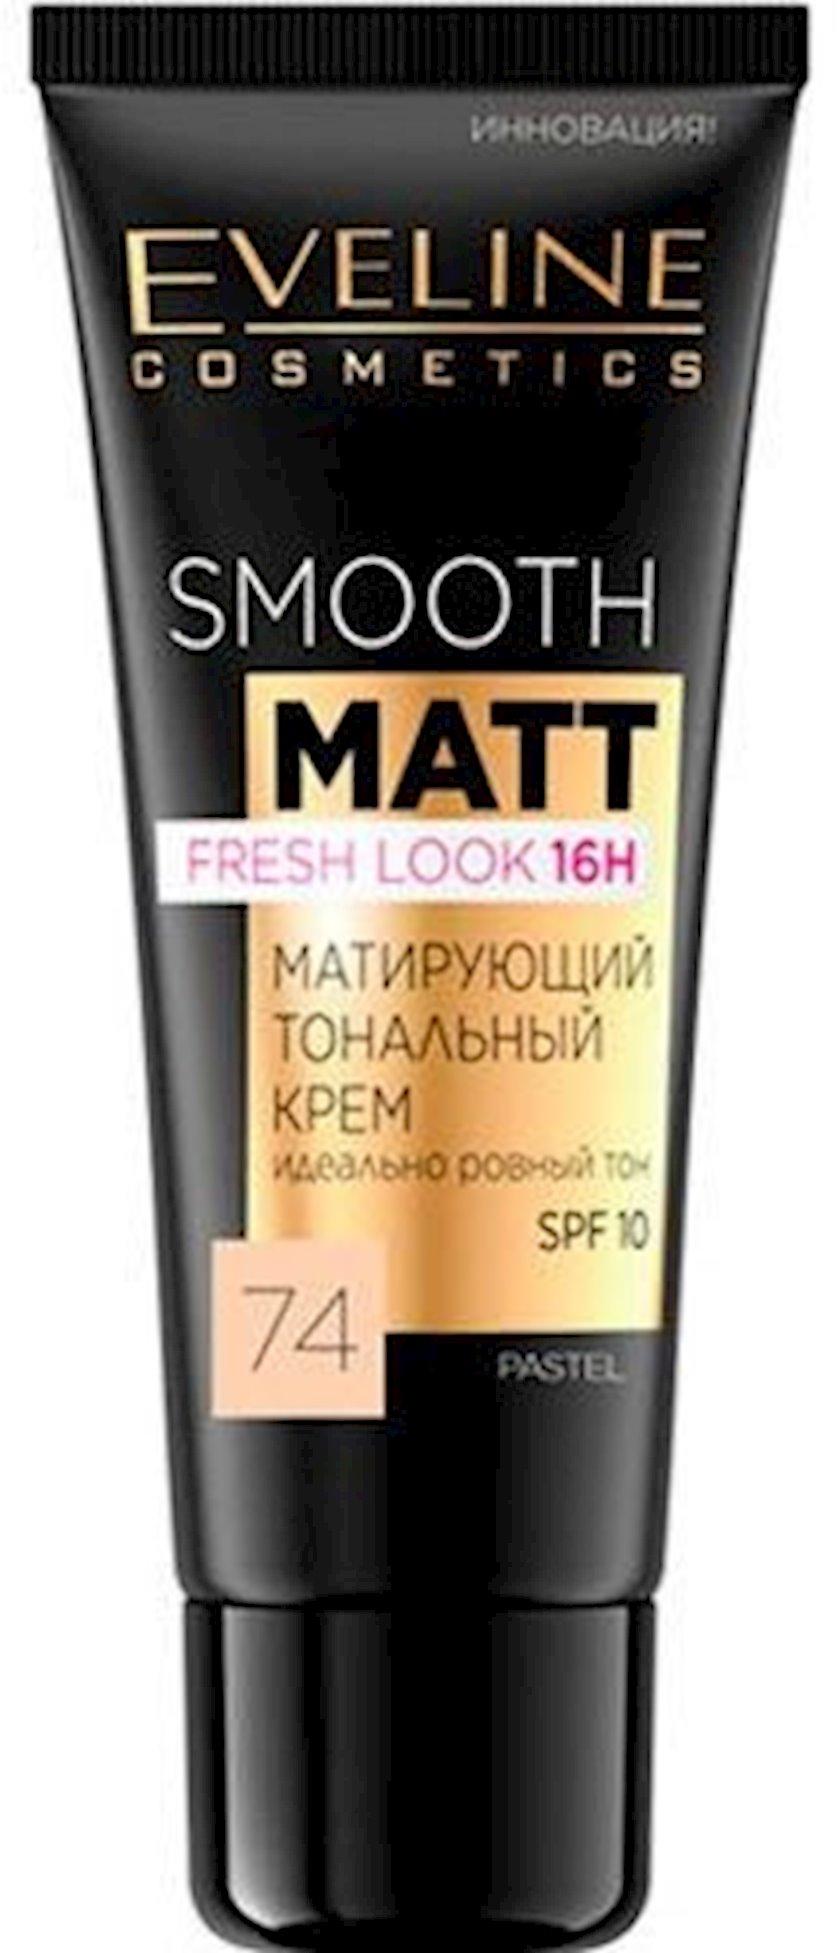 Matlaşdırıcı tonal krem Eveline Smooth Matt SPF10 ton 74 Pastel 30 ml